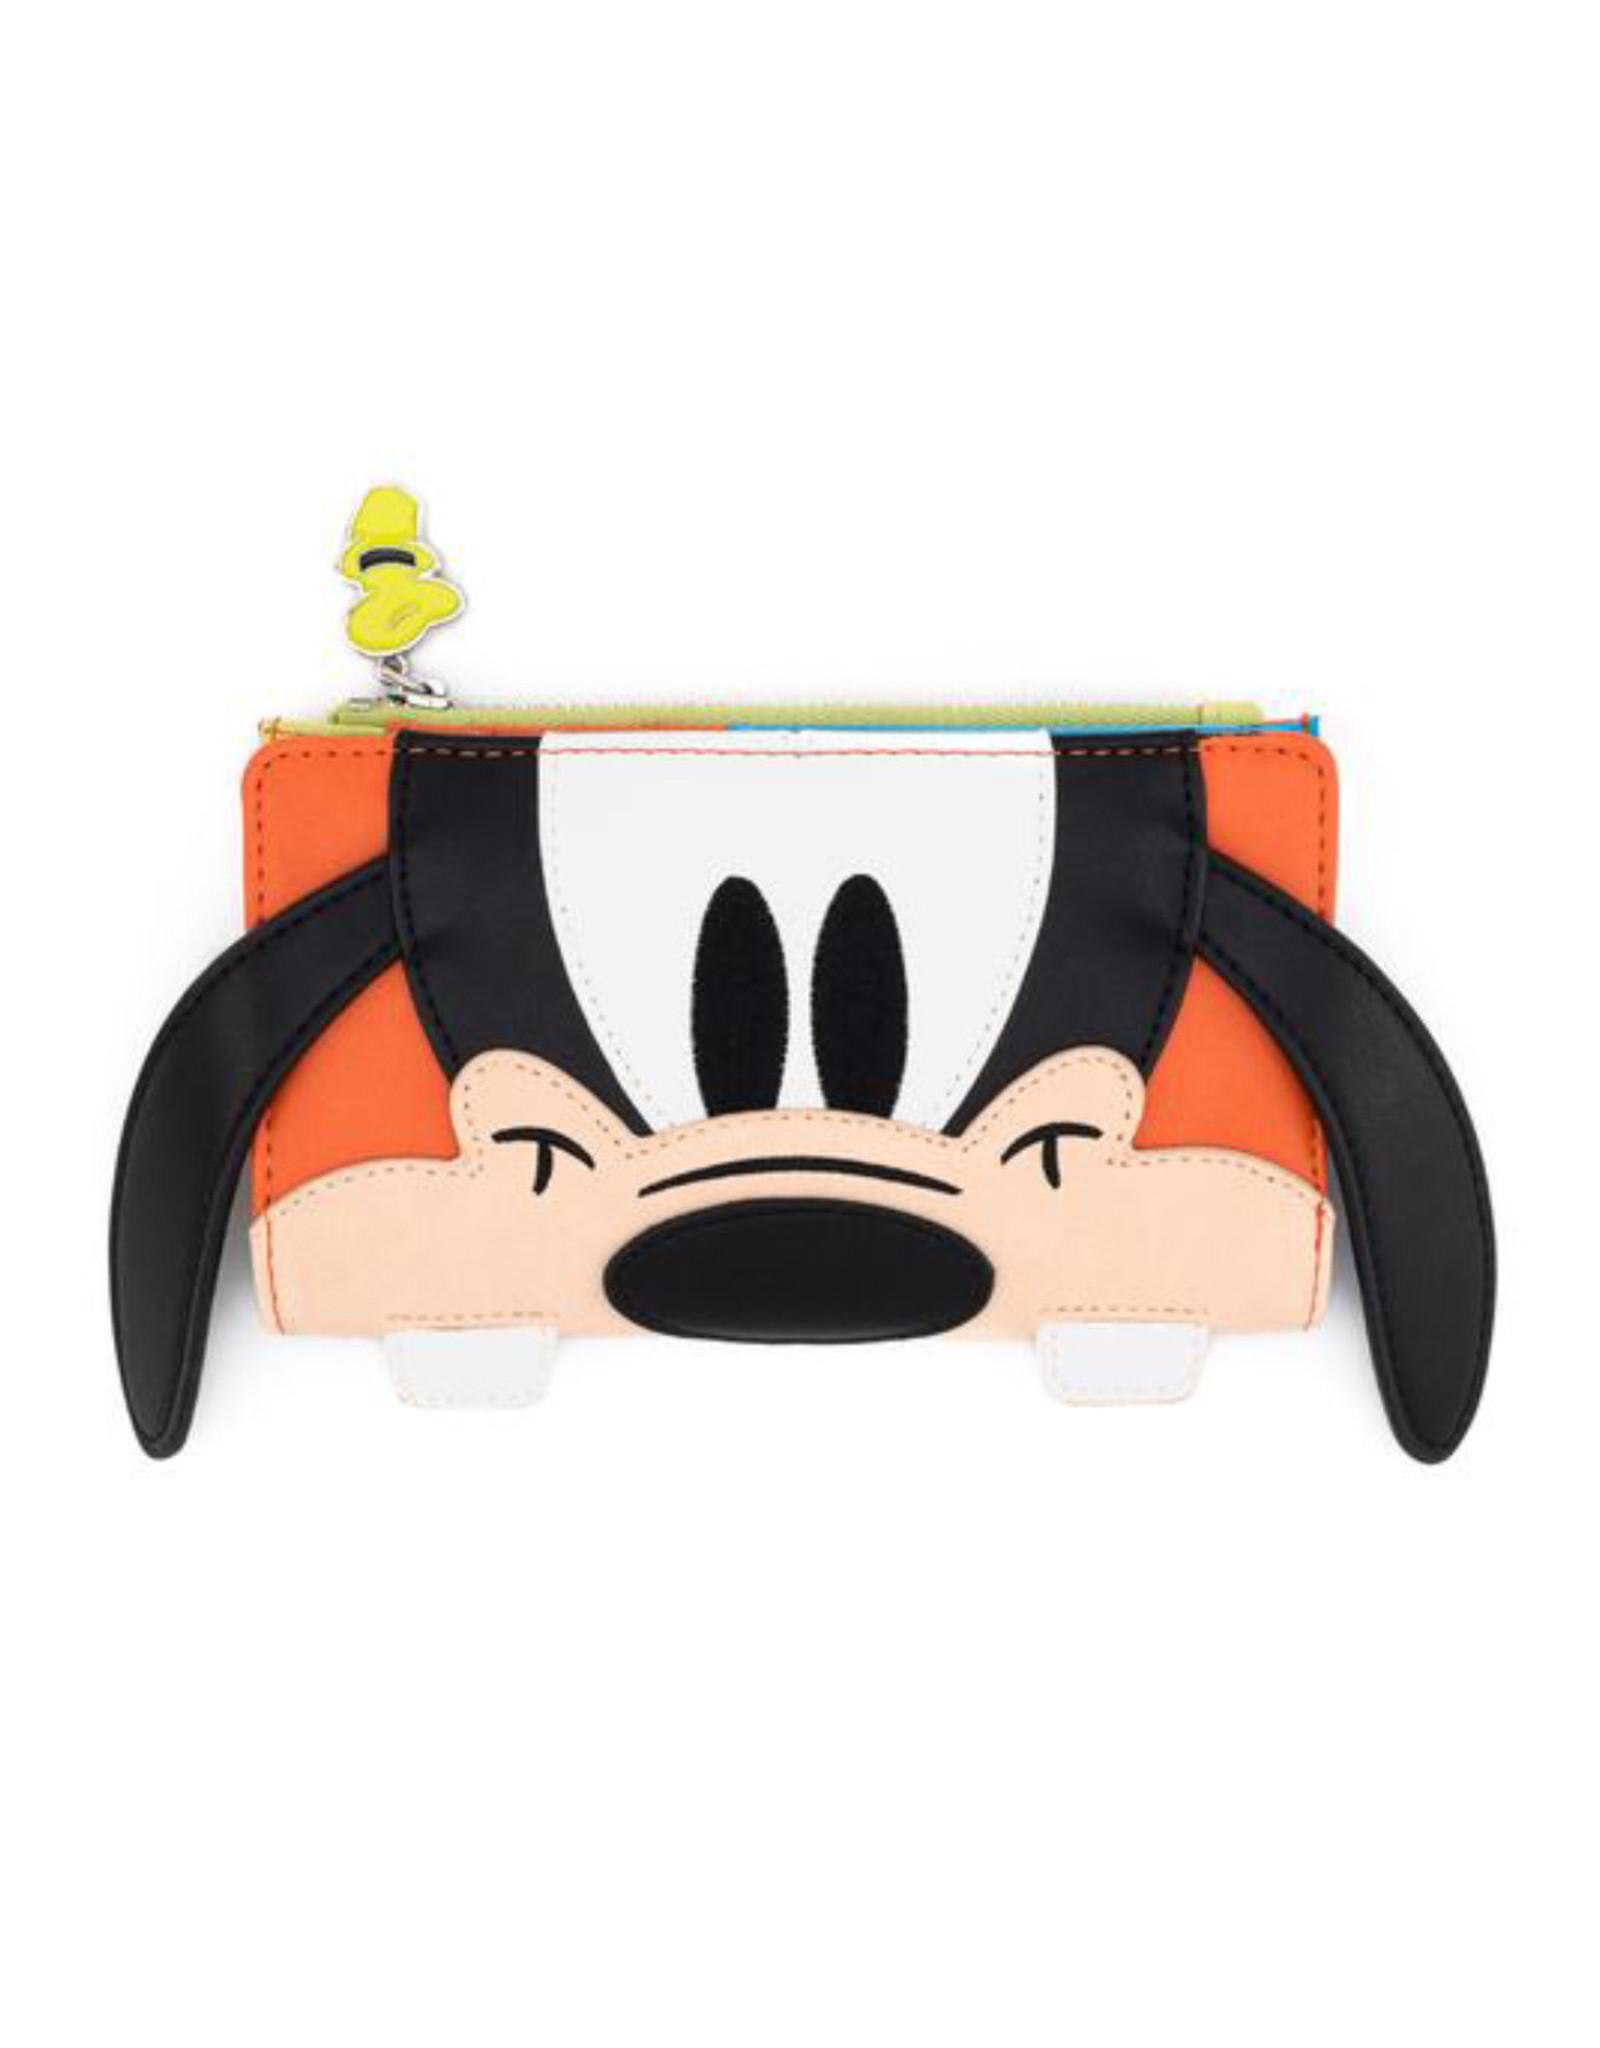 Disney Disney (  Loungefly Wallet ) Goofy